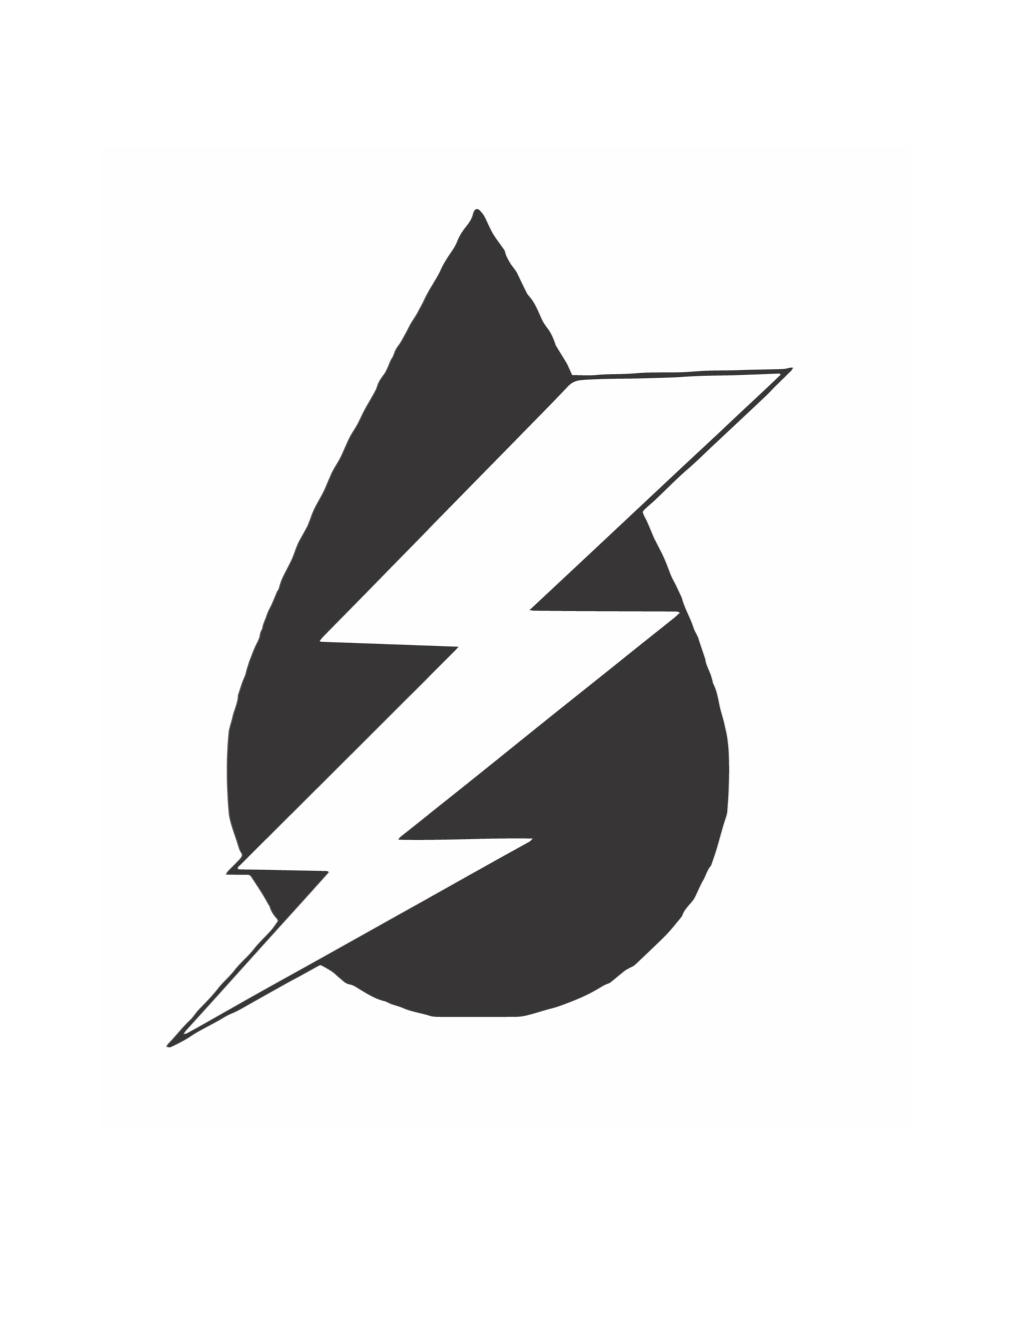 Linzy Pelt Graphic Symbolism